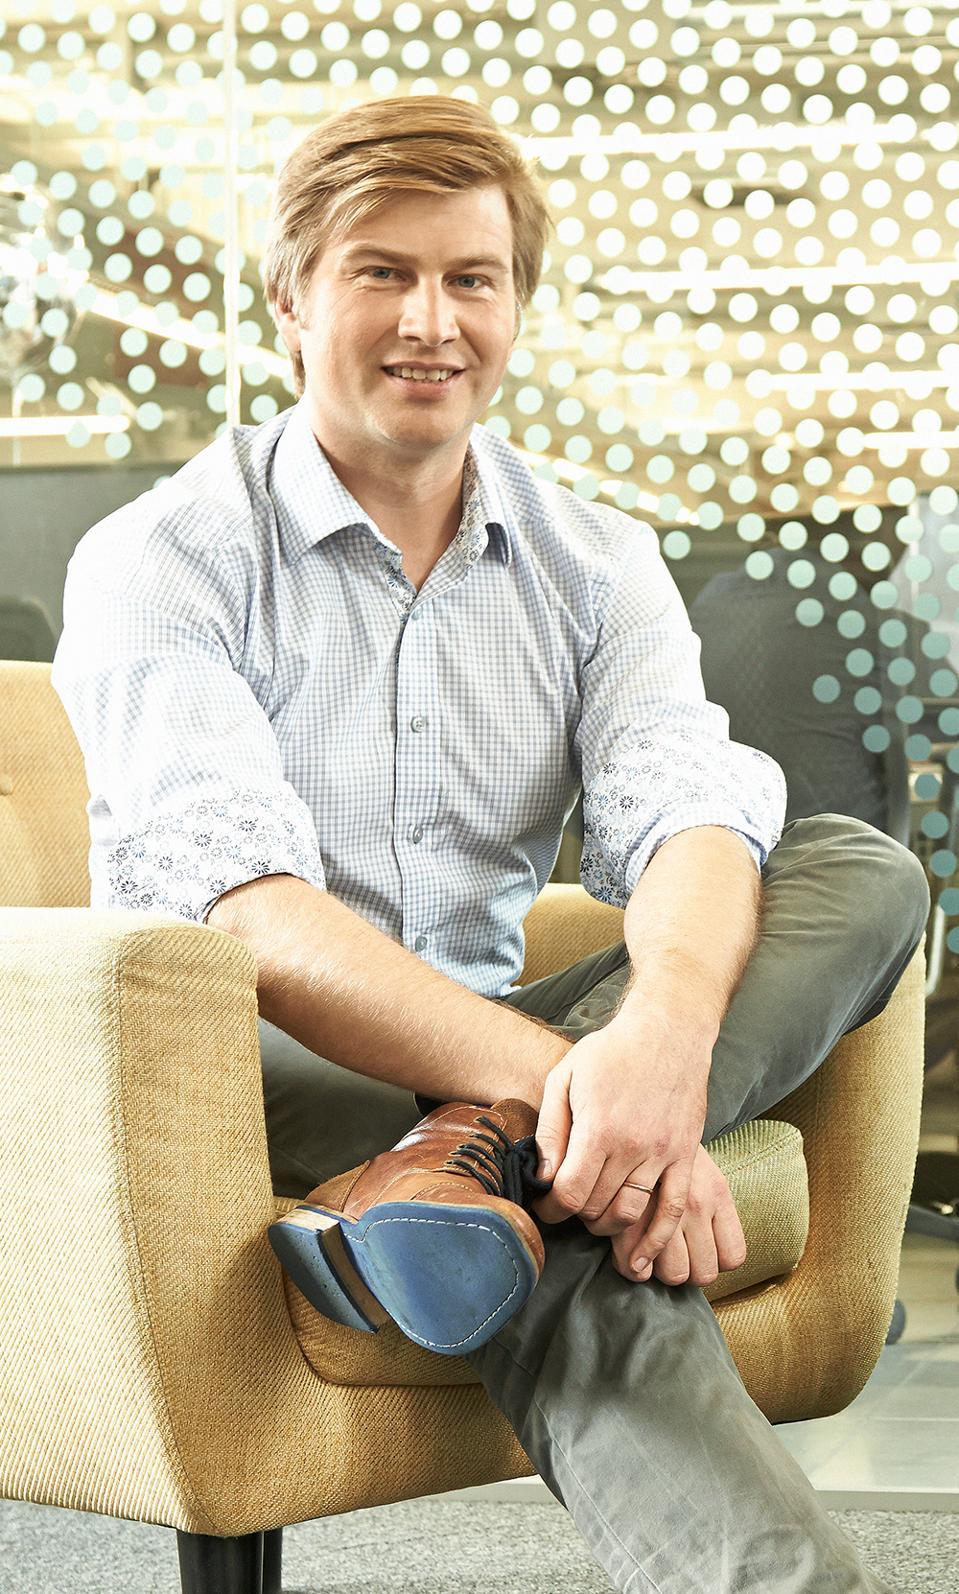 TransferWise CEO Kristo Käärmann